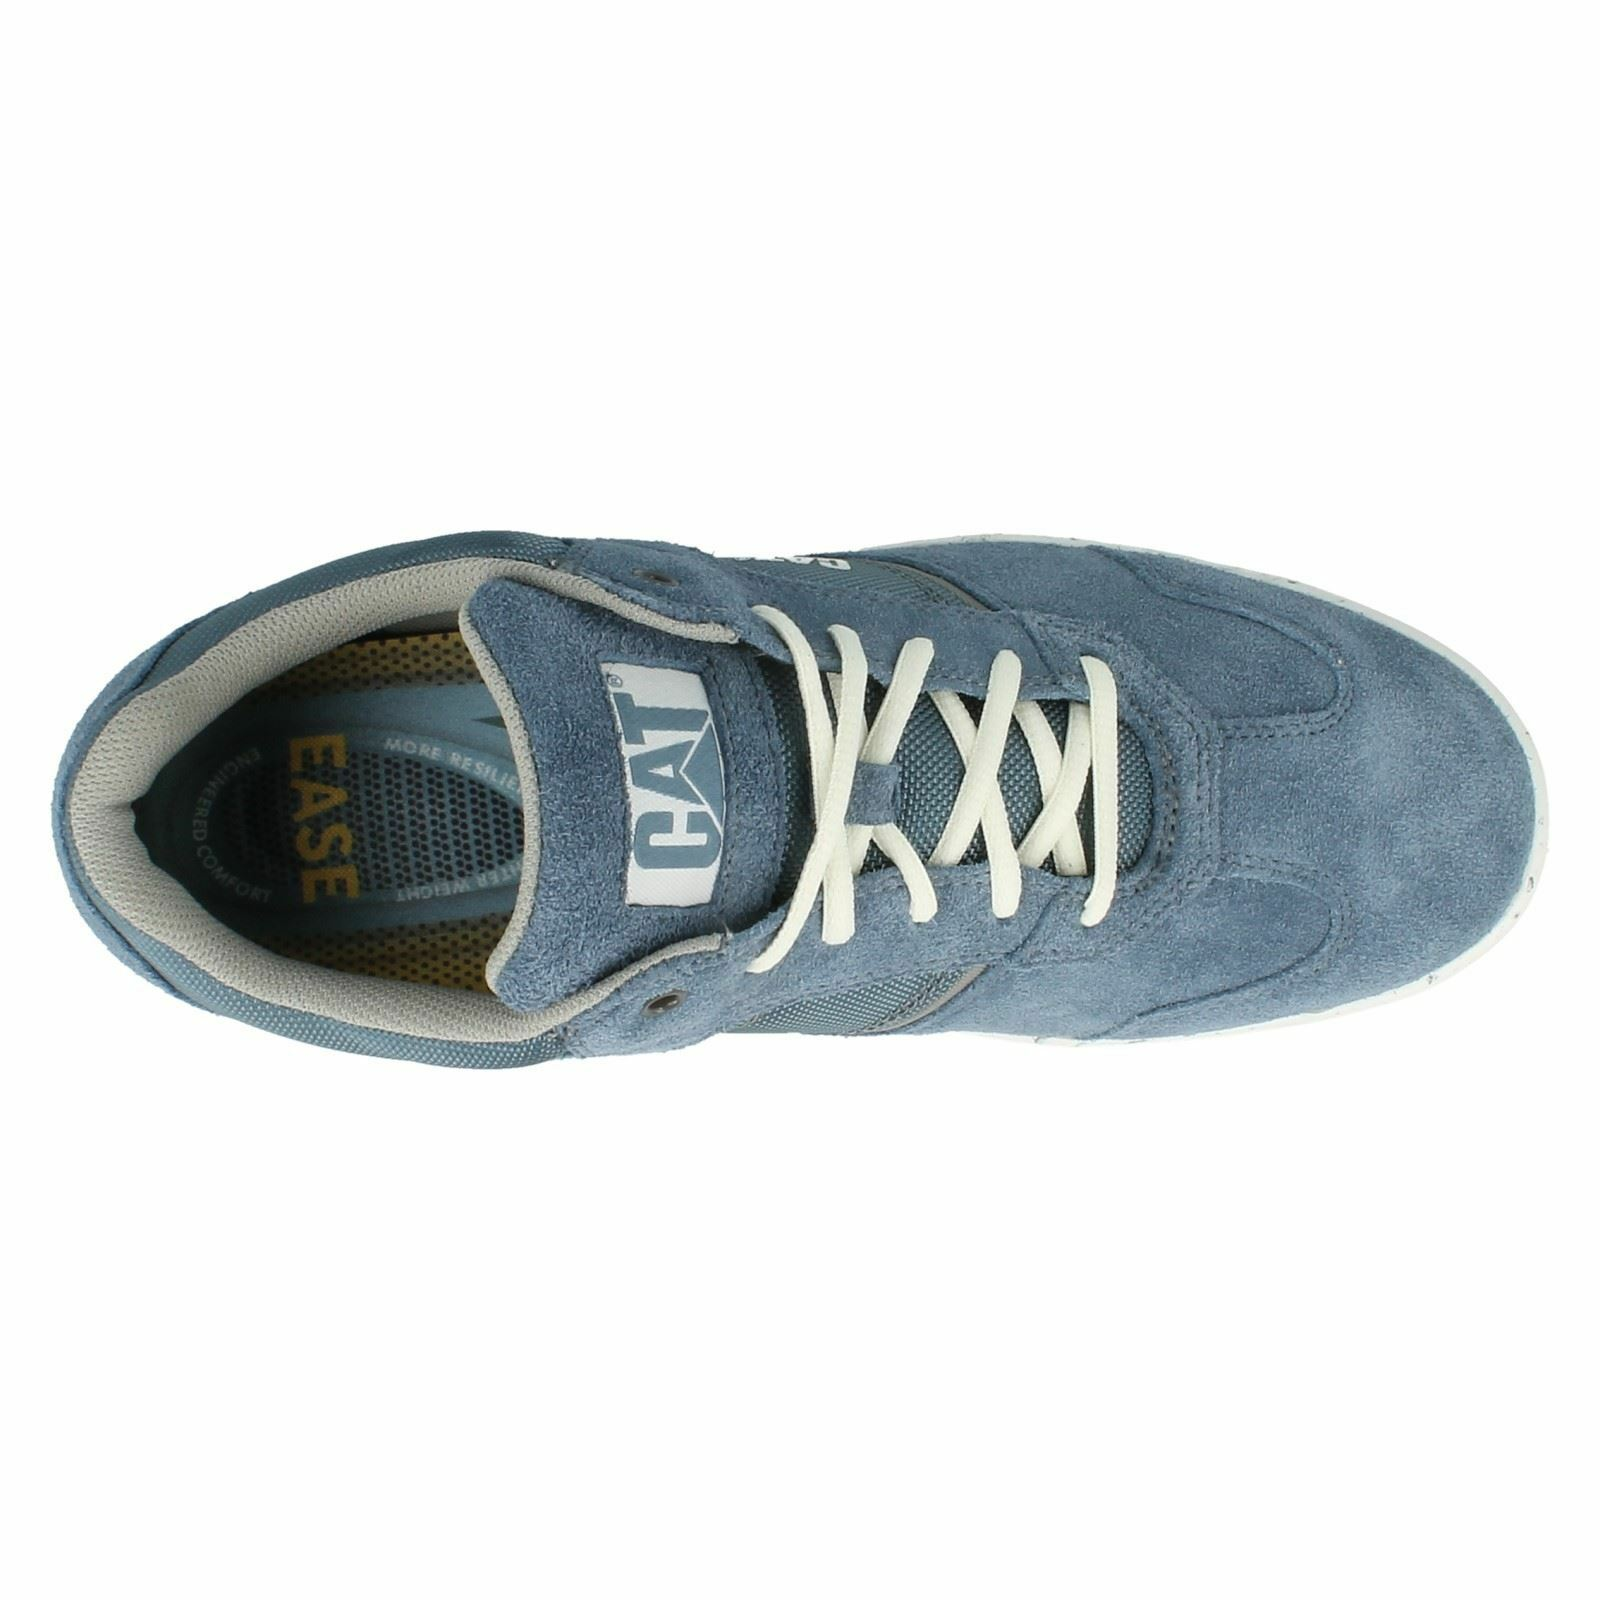 Herren Dunkelgrau/Blau Zum Schnüren Leder 11 Caterpillar Turnschuhe UK-Größen 6 11 Leder 5cdf0f